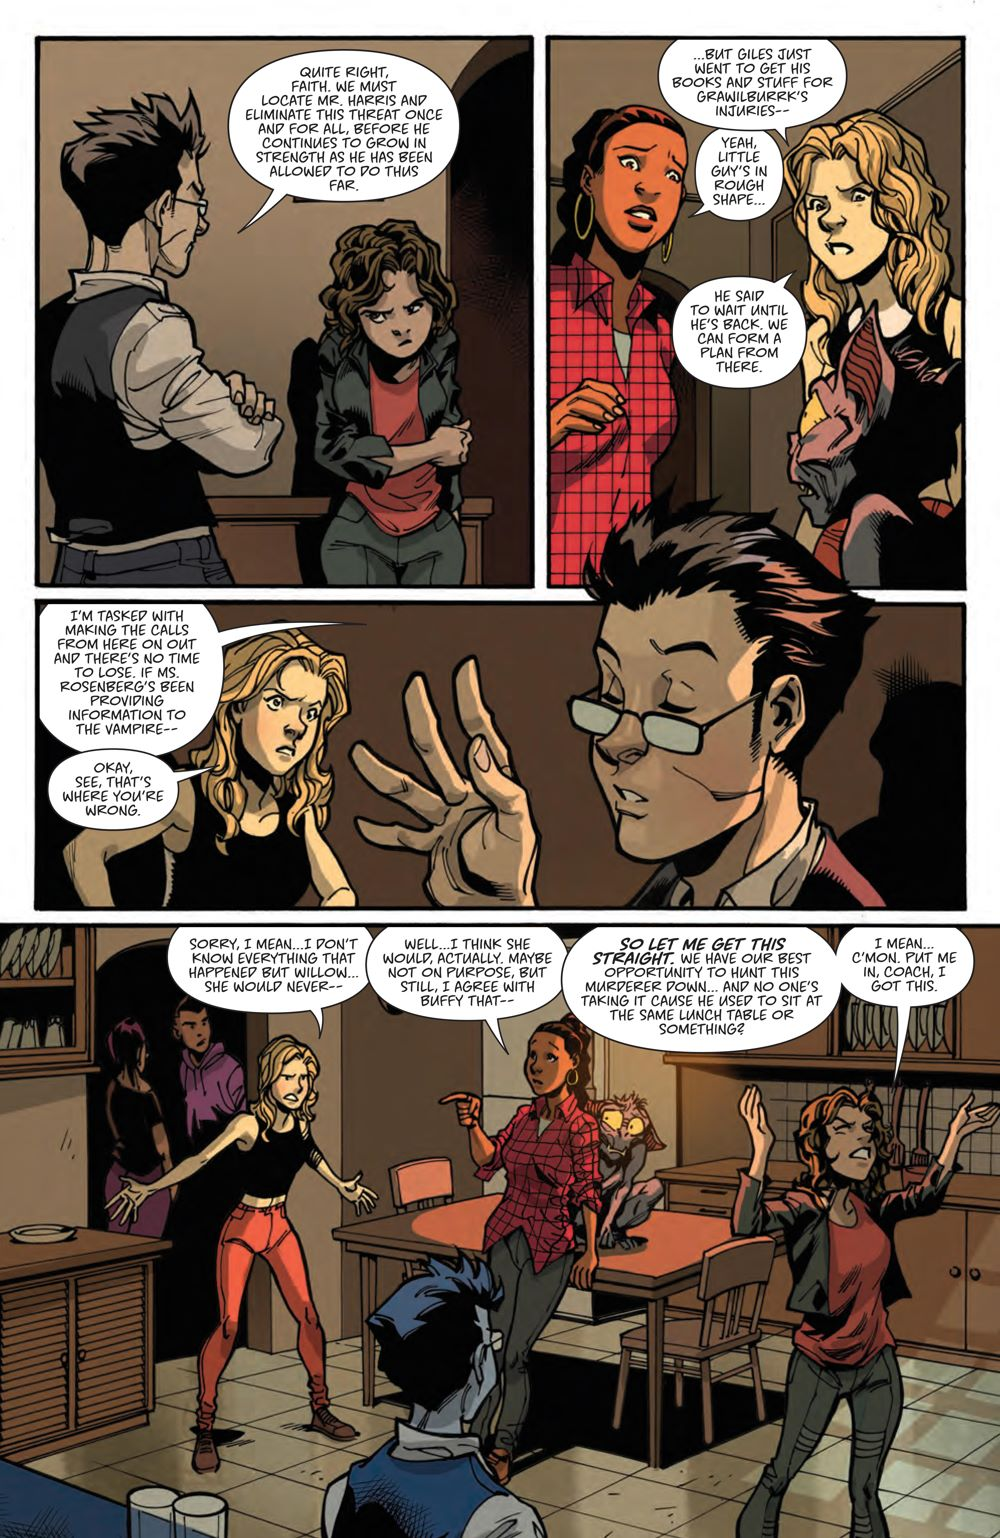 Buffy_023_PRESS_7 ComicList Previews: BUFFY THE VAMPIRE SLAYER #23